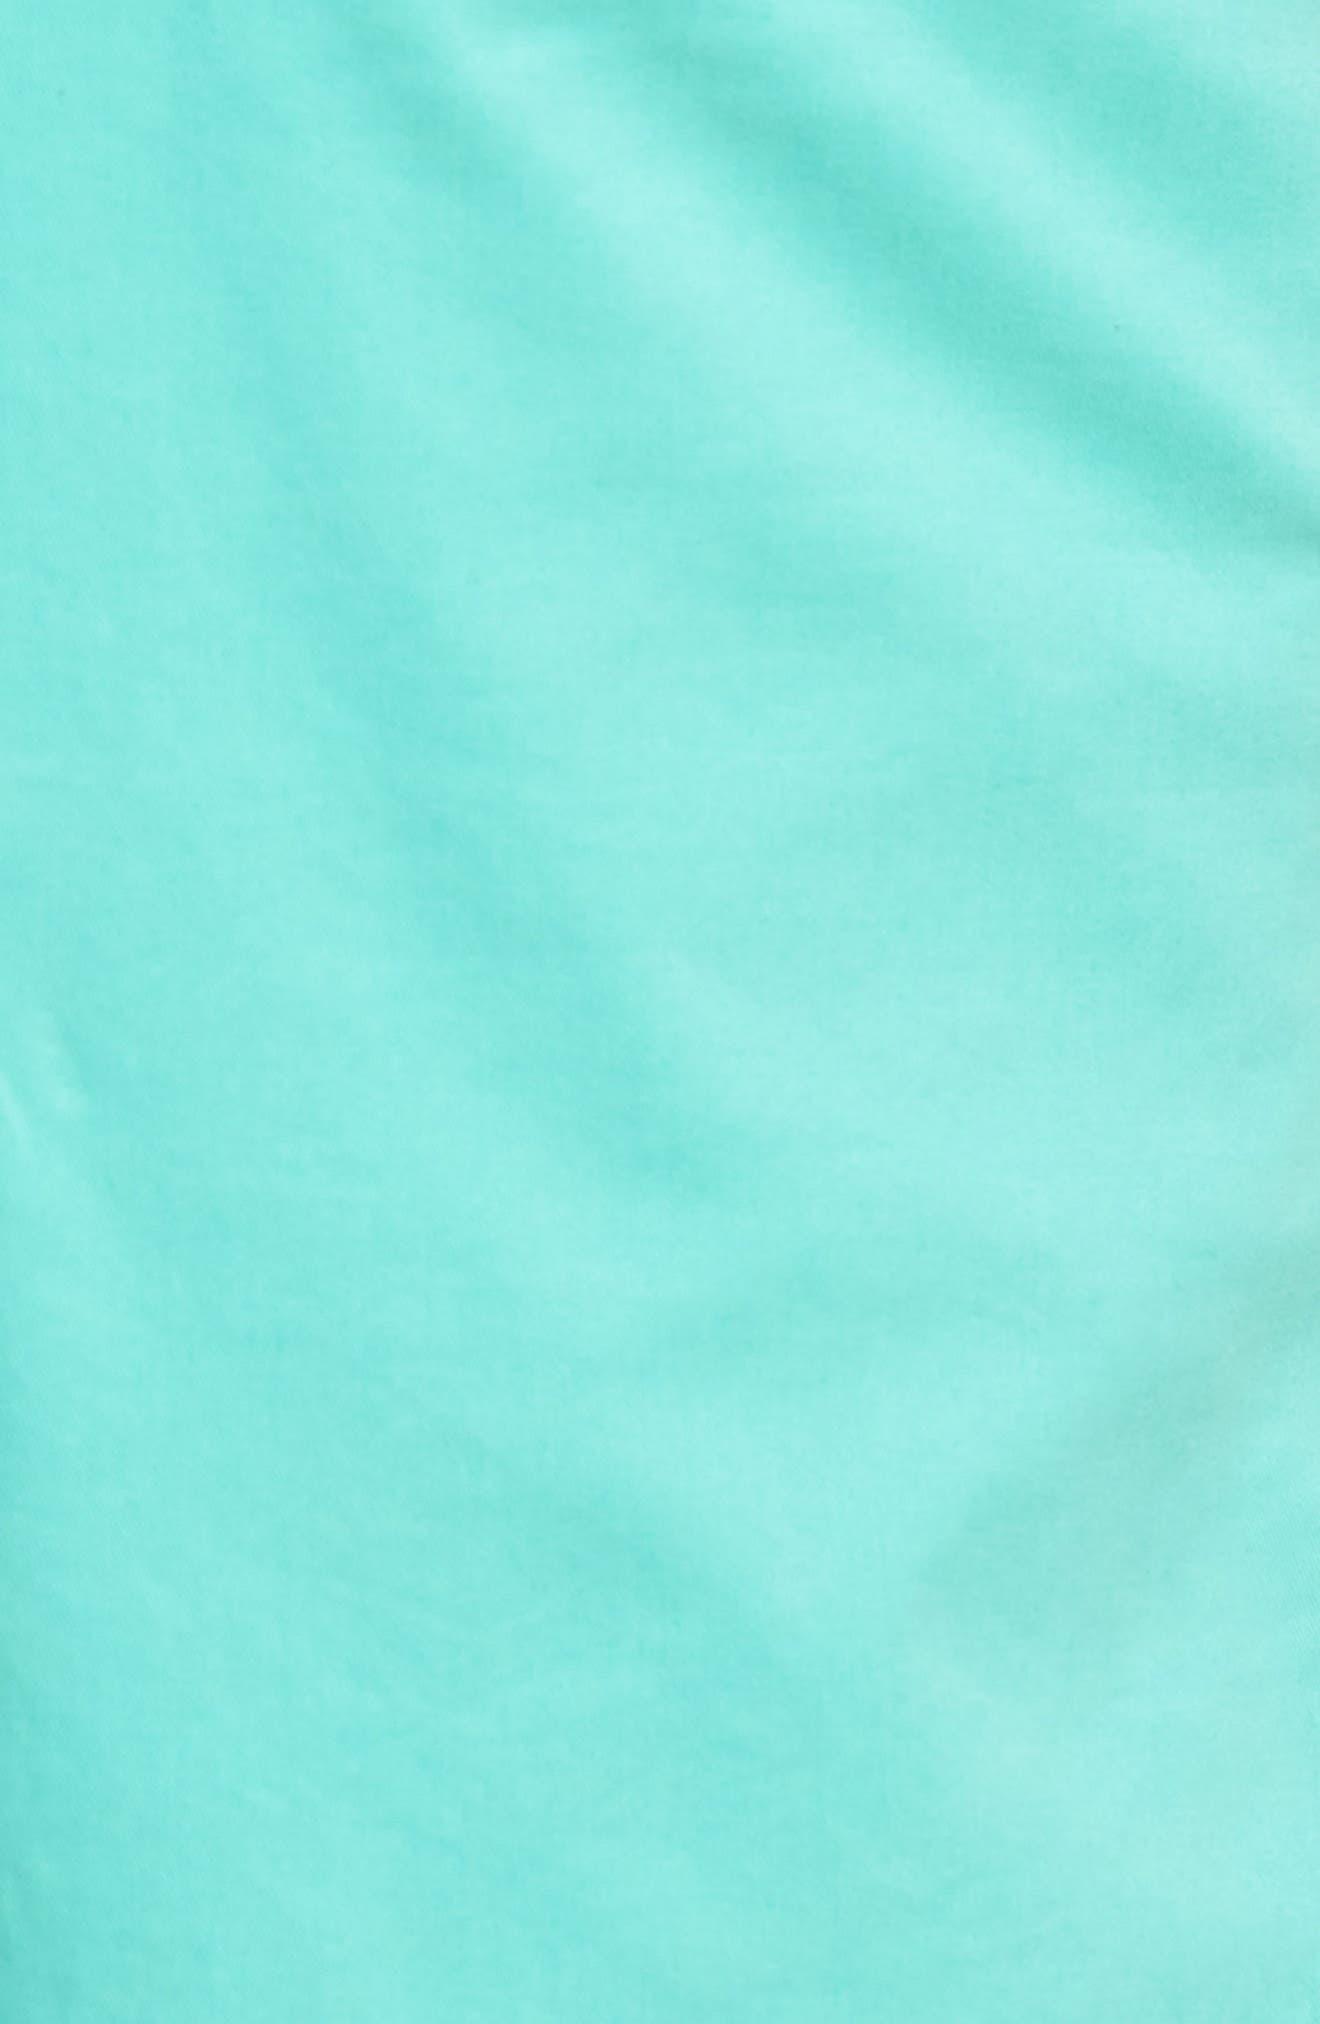 Ballard Slim Fit Stretch Chino 7-Inch Shorts,                             Alternate thumbnail 54, color,